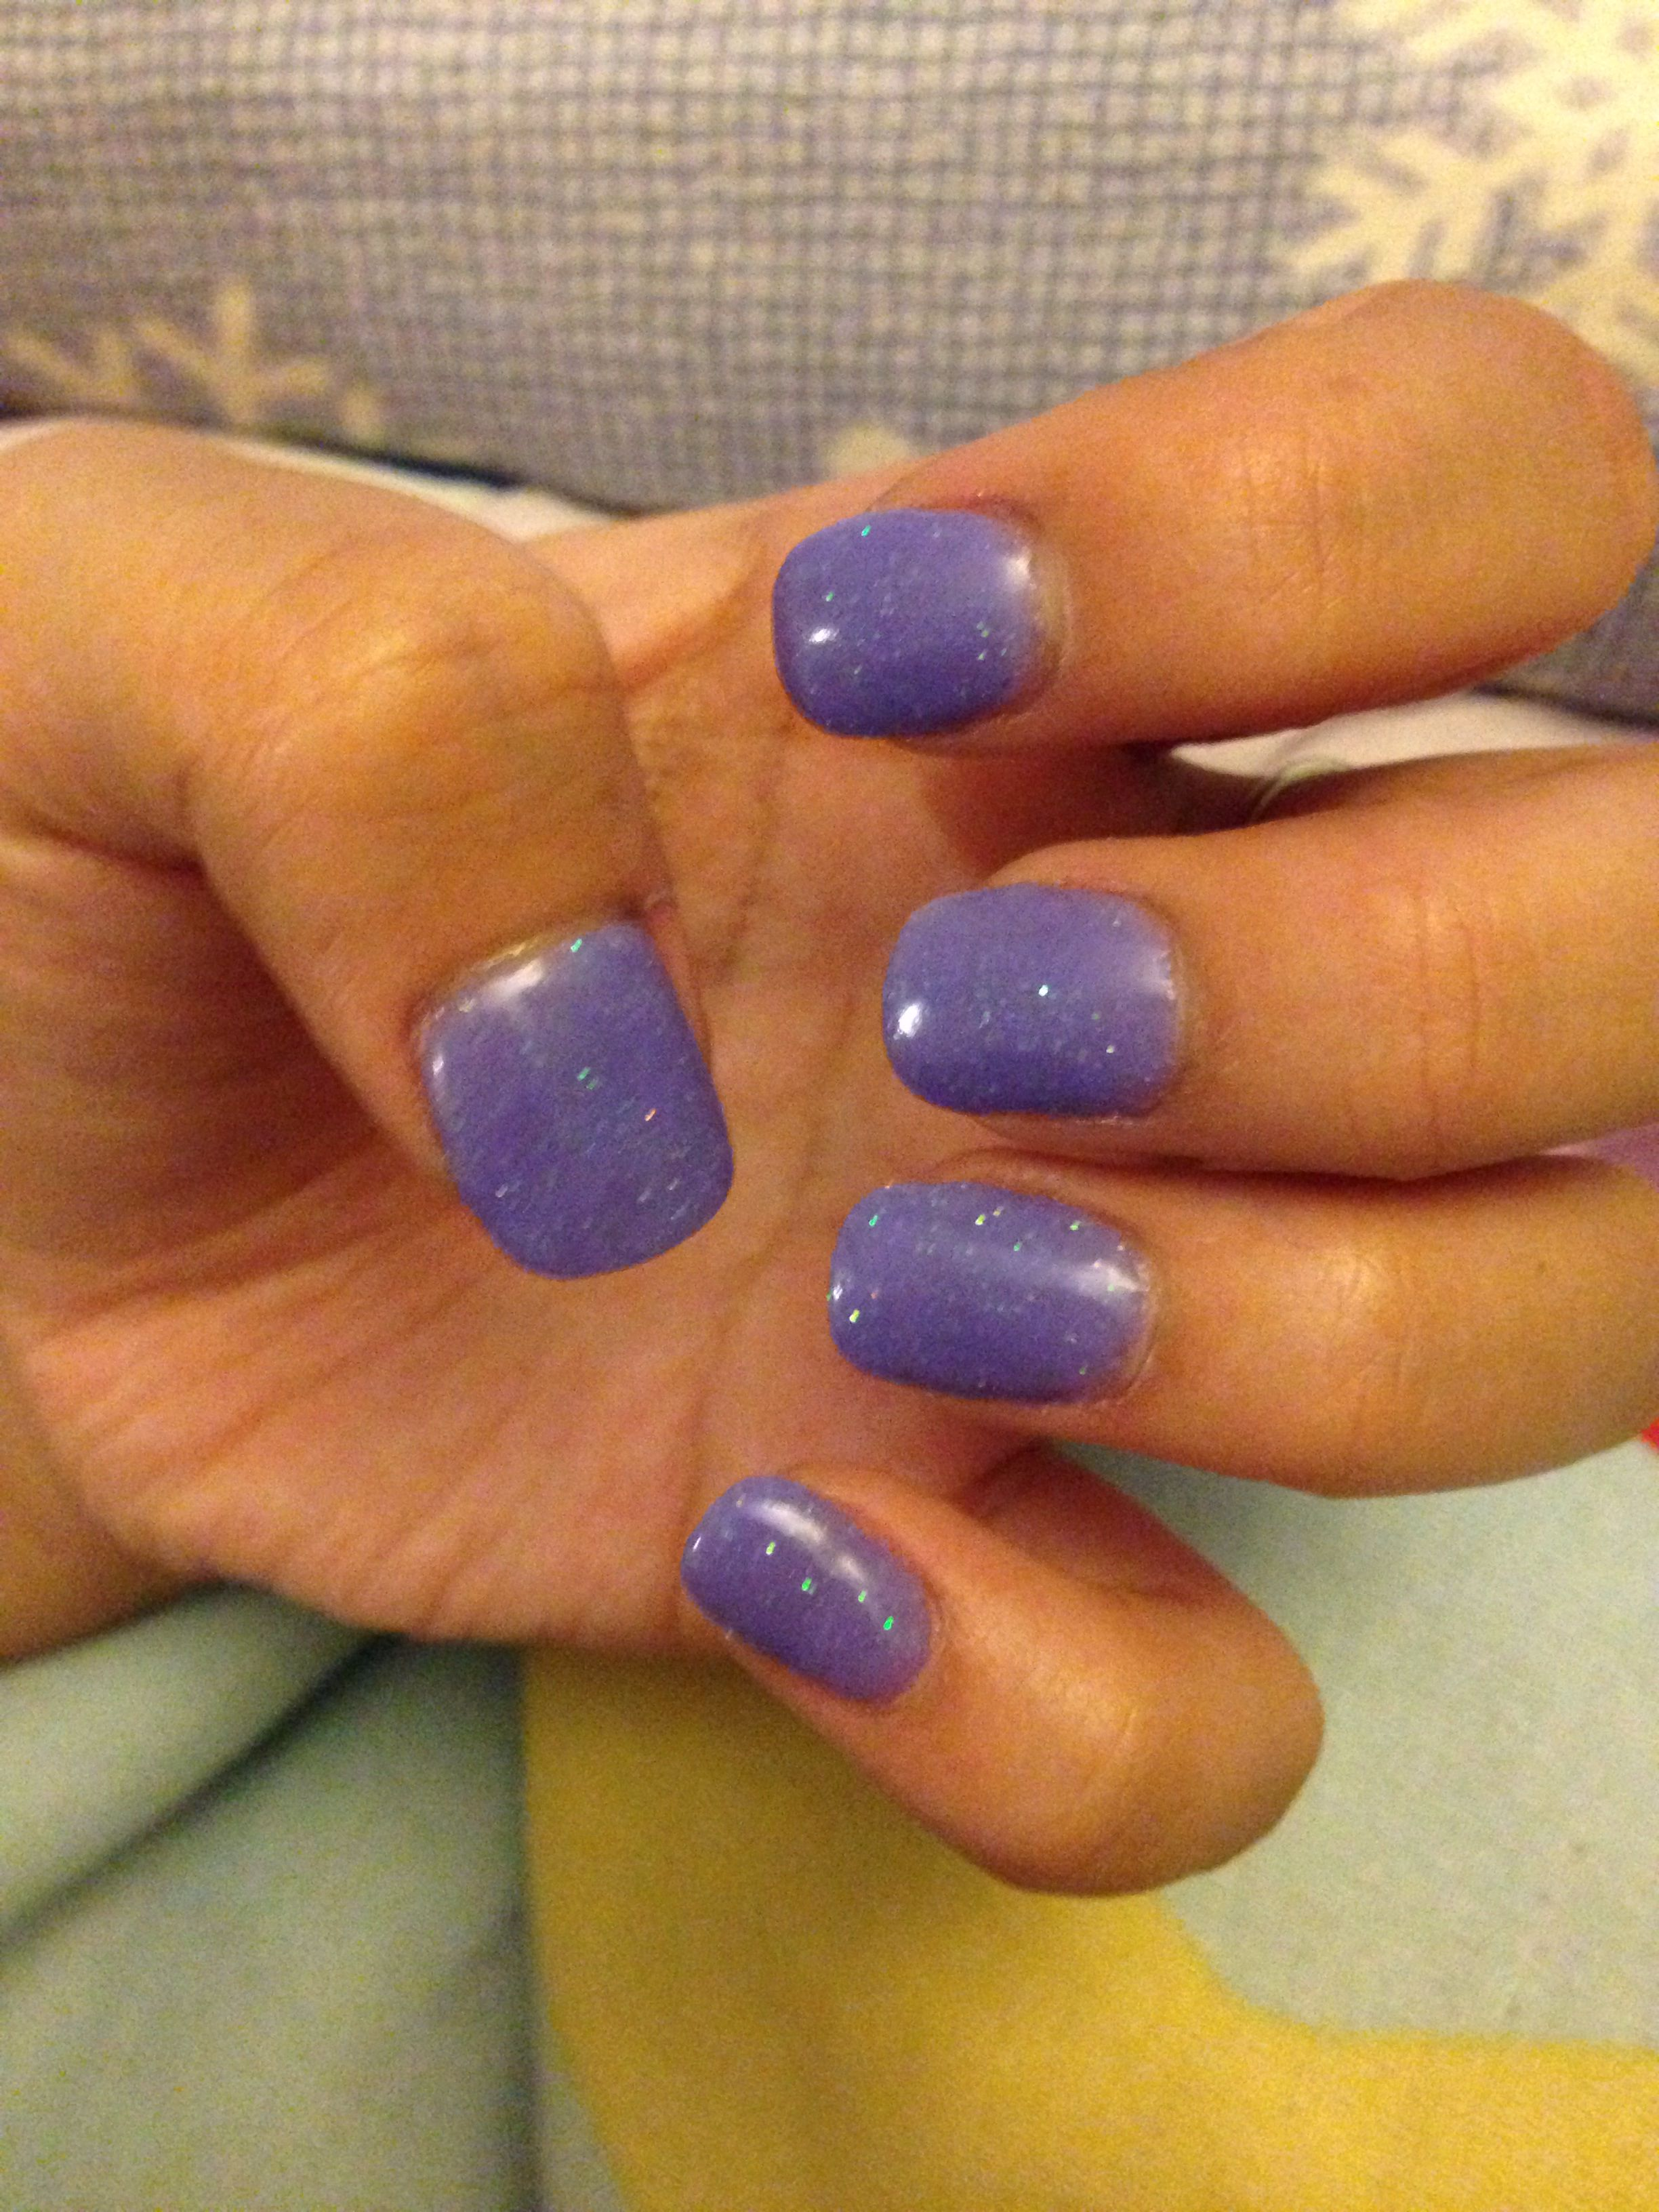 Image result | Sns nails colors, Sns nails, Glitter nails